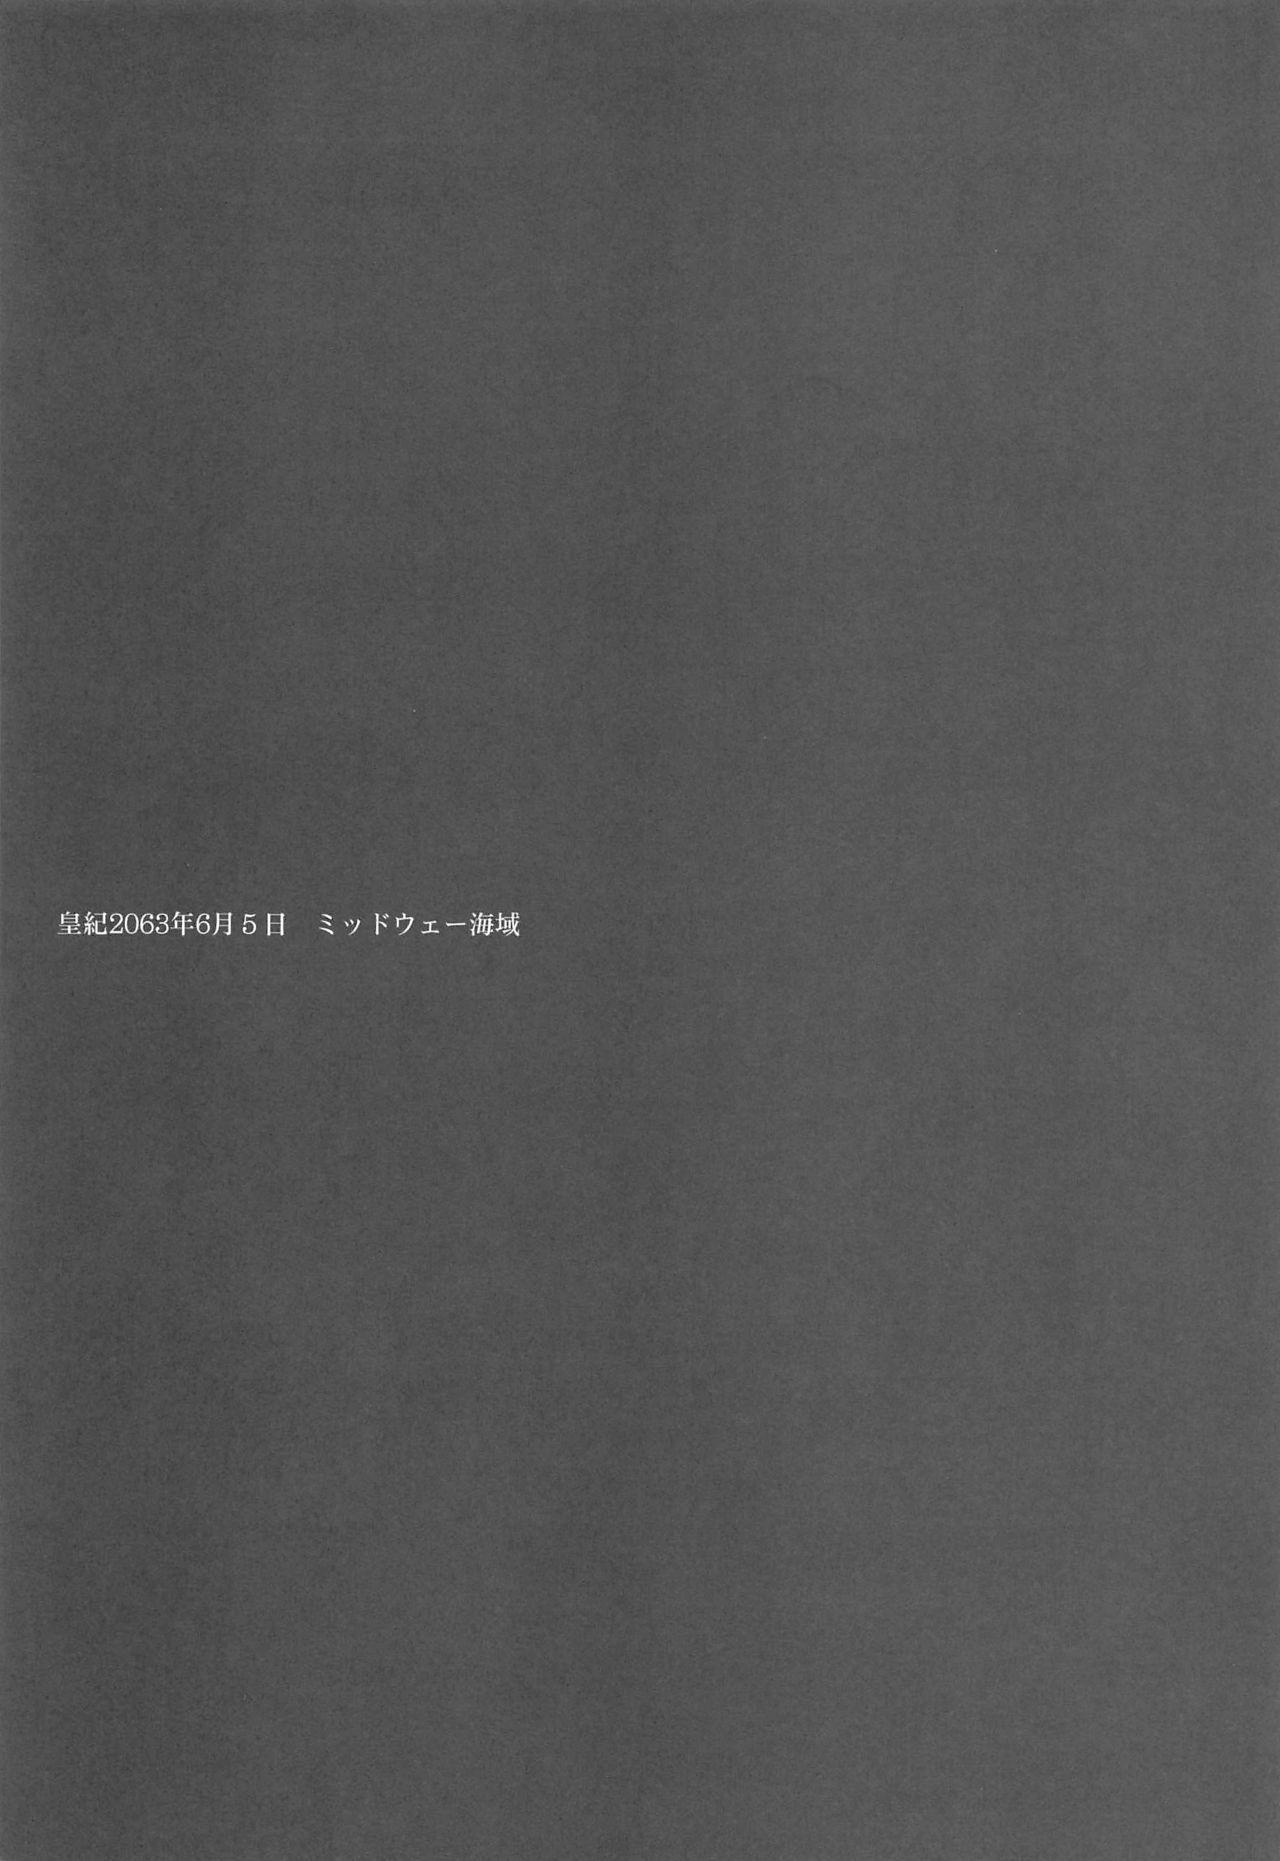 (C85) [Nise-Jyuusyofutei (Nakamura Takeshi)] Hokui 30-do 13-pun 59-byou Seikei 179-do 7-fun 12-byou (Kantai Collection -KanColle-) 1